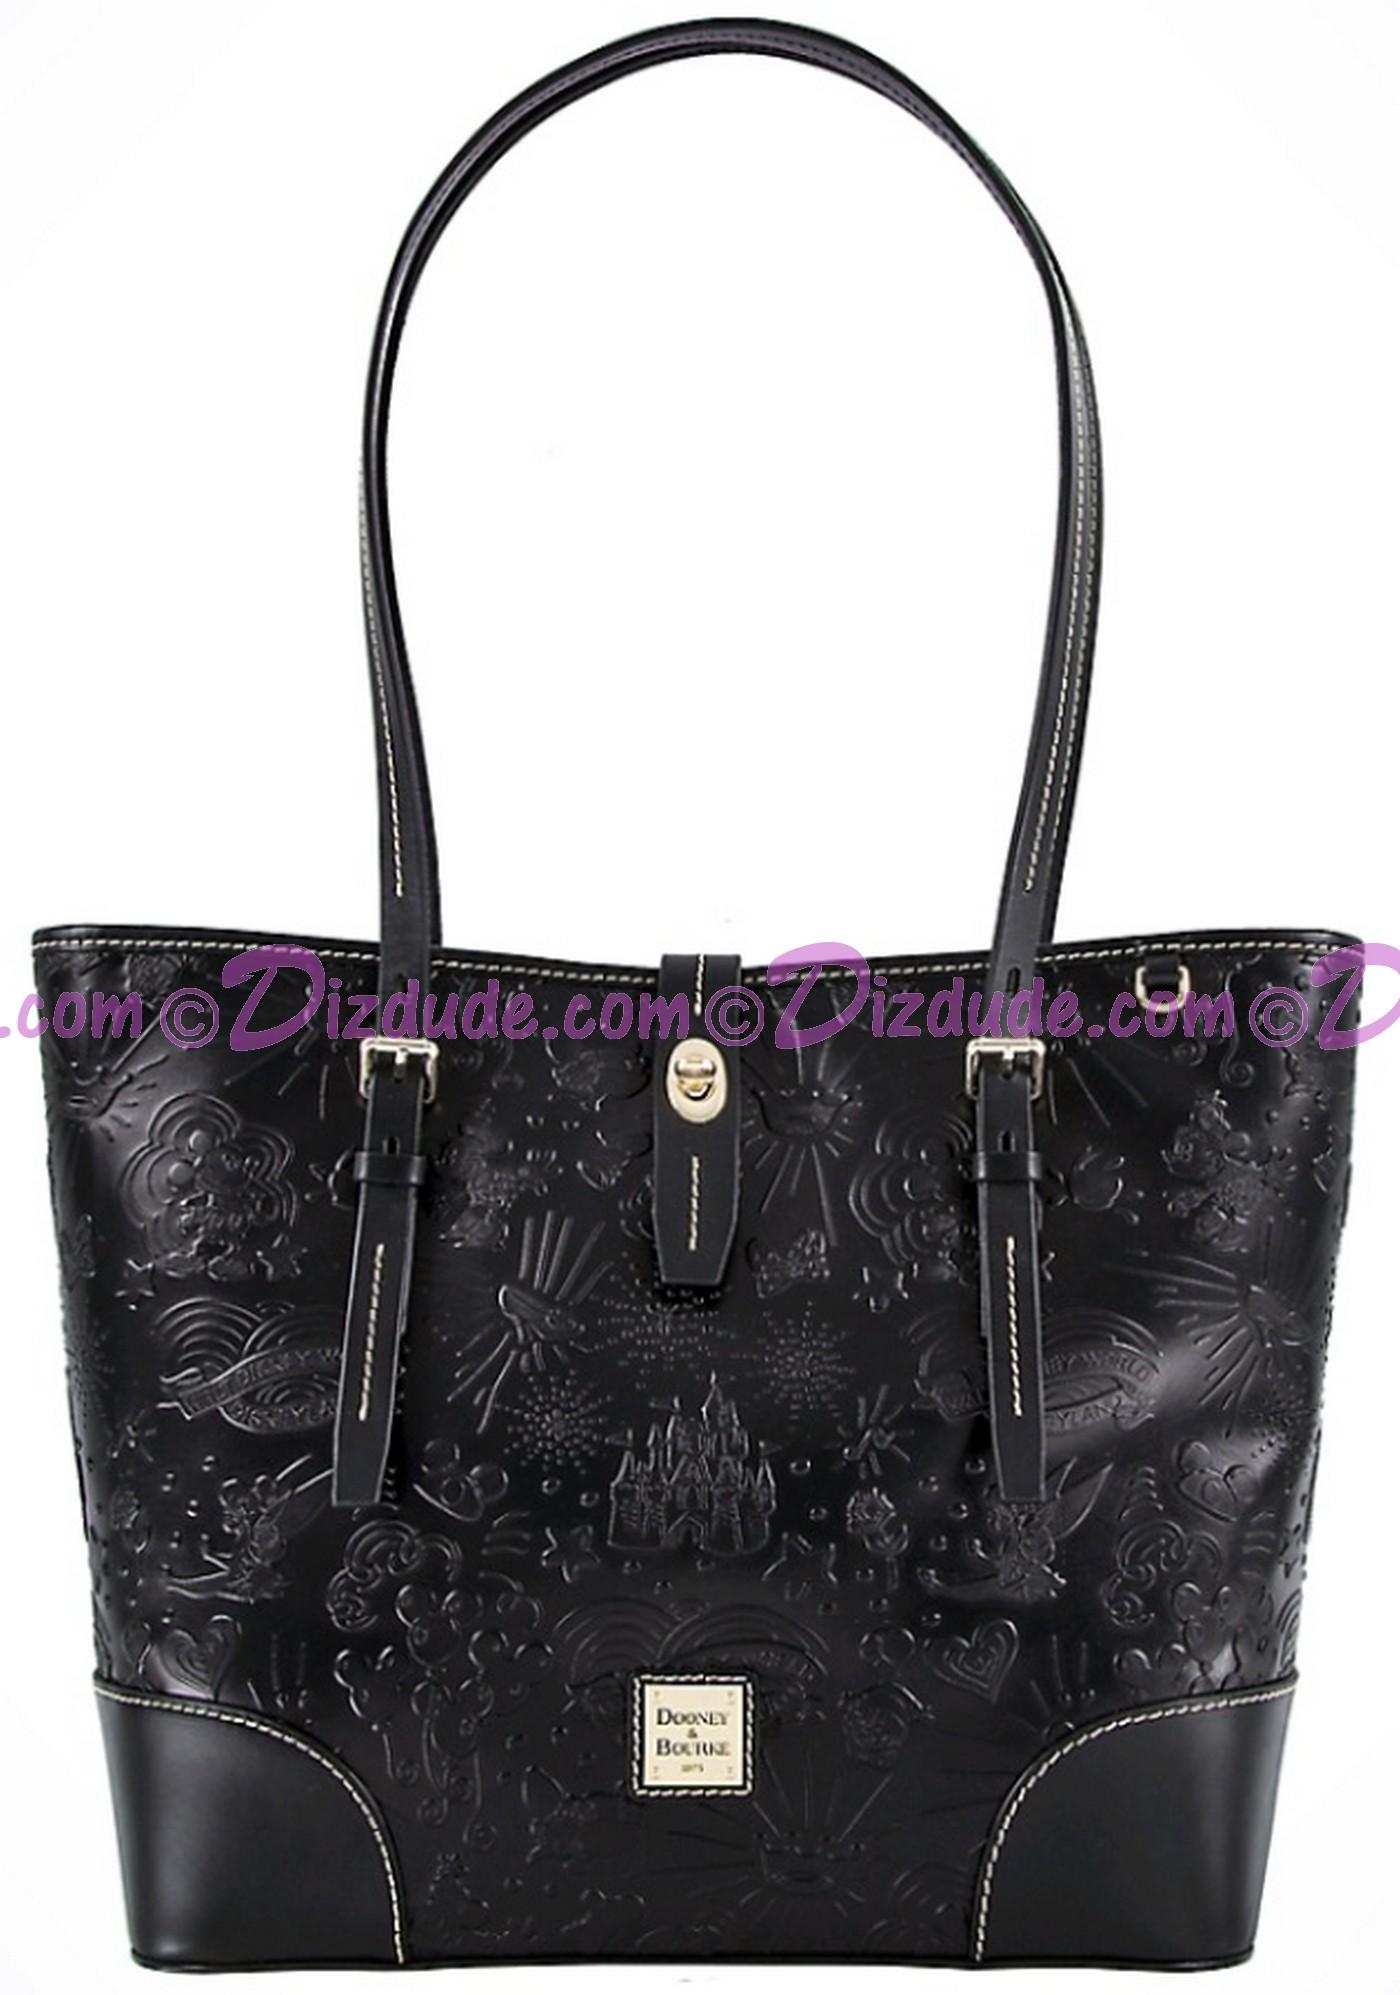 Dooney & Bourke Black Leather Sketch Tote handbag - Disney World Exclusive  © Dizdude.com